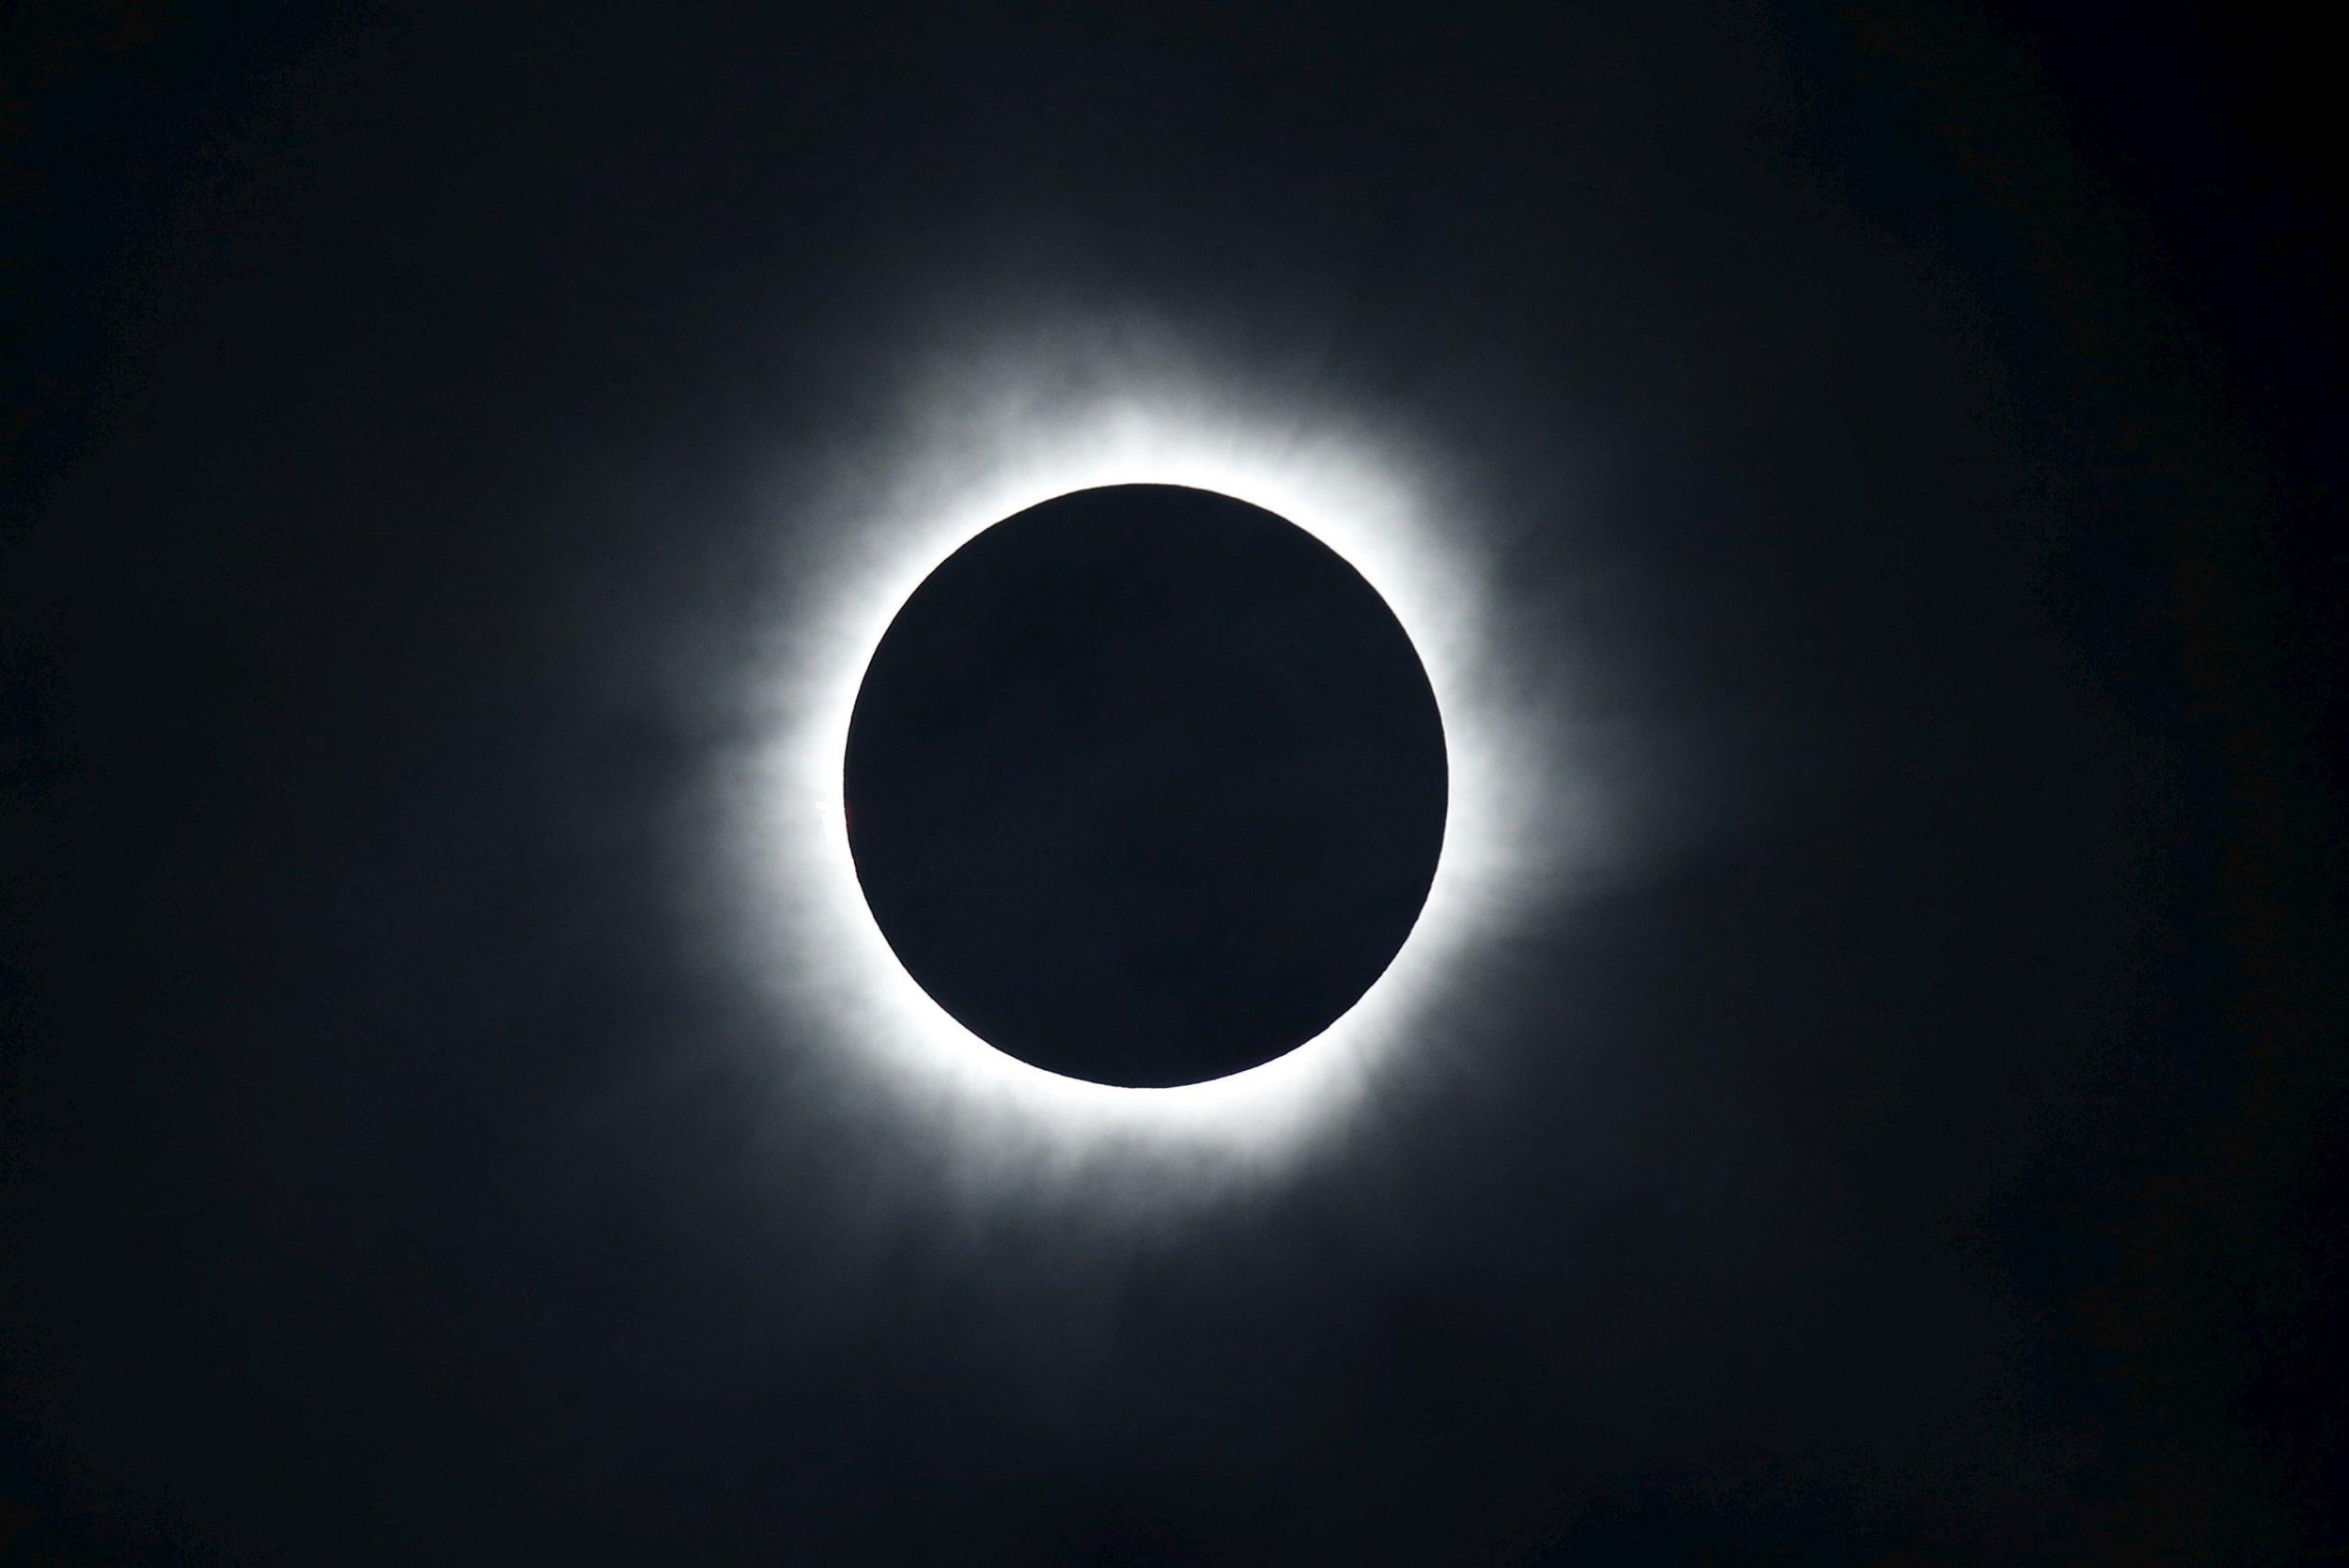 6-19-17 Total solar eclipse